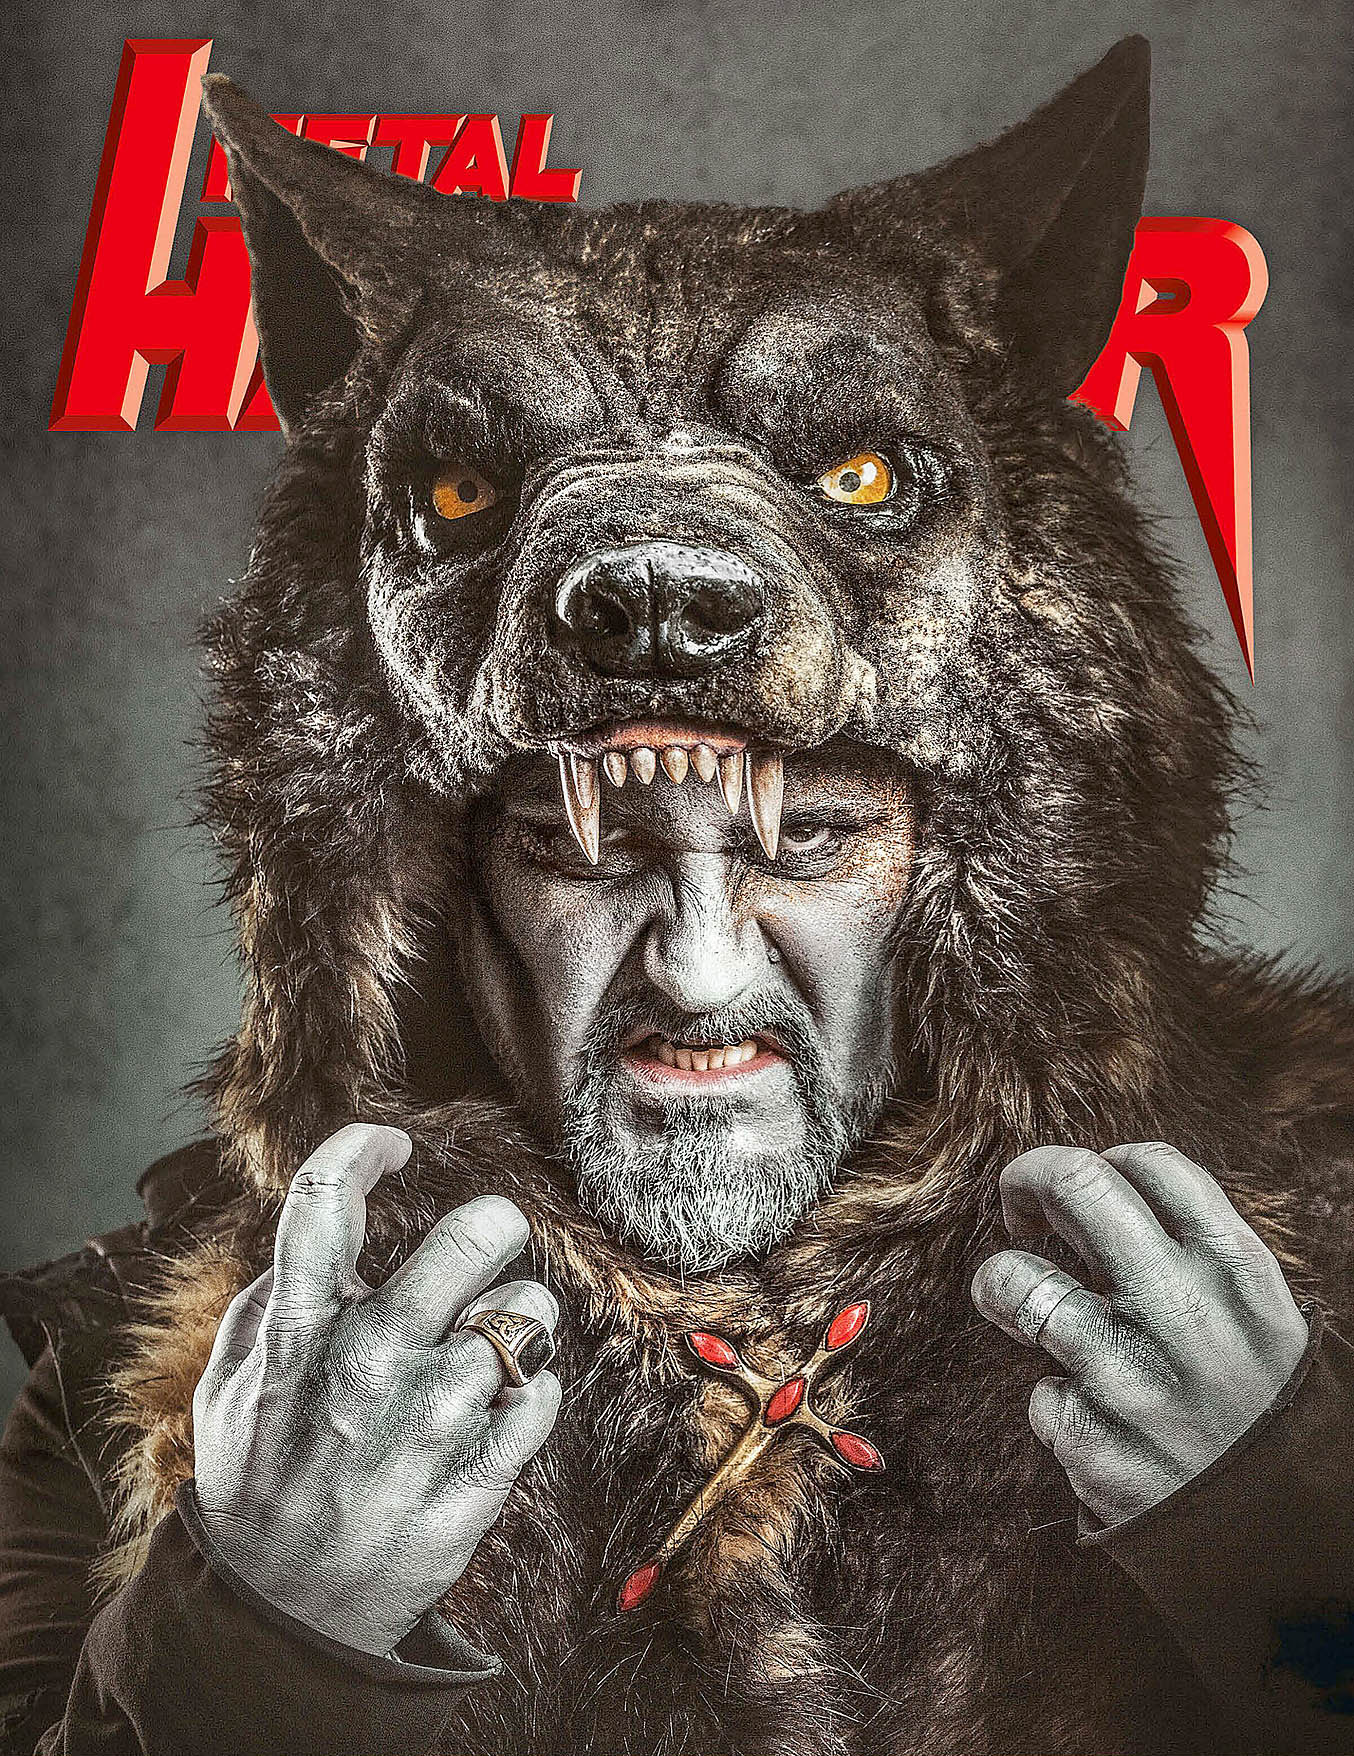 Metal Hammer Ger 2021-07 a.jpg